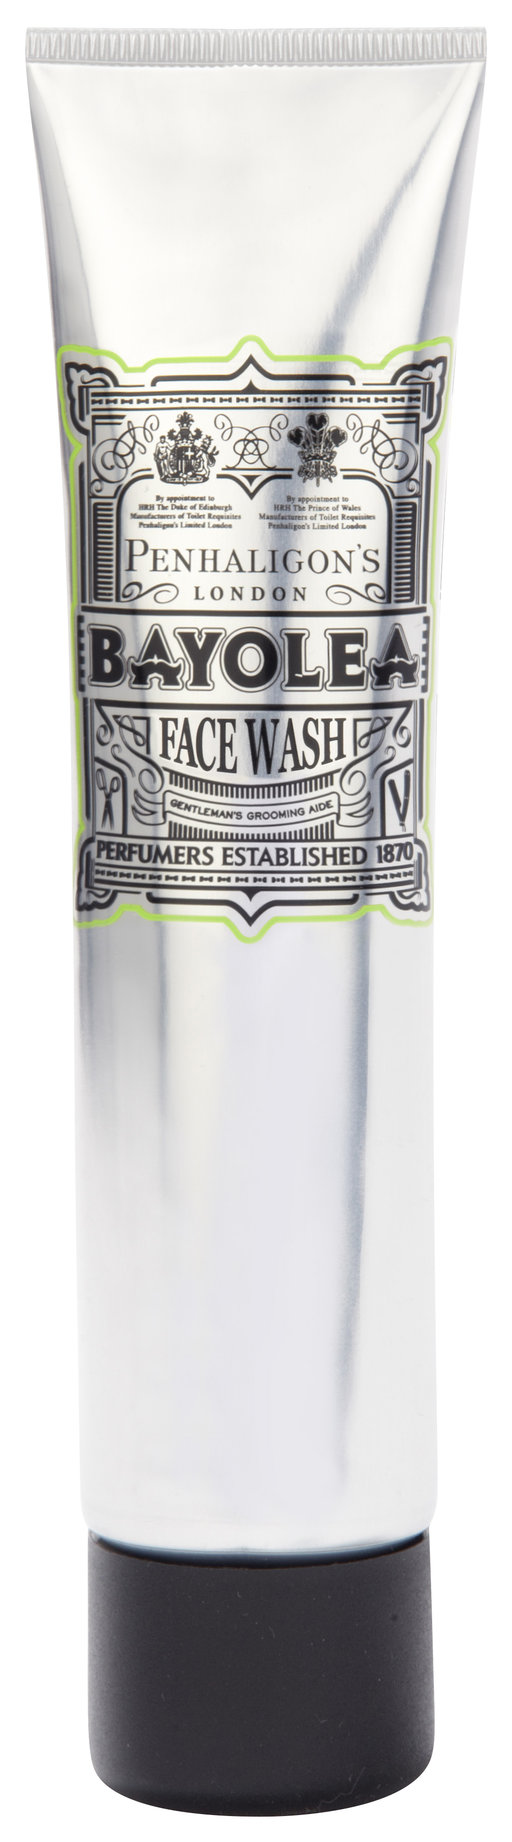 Penhaligon's Bayolea Face Wash